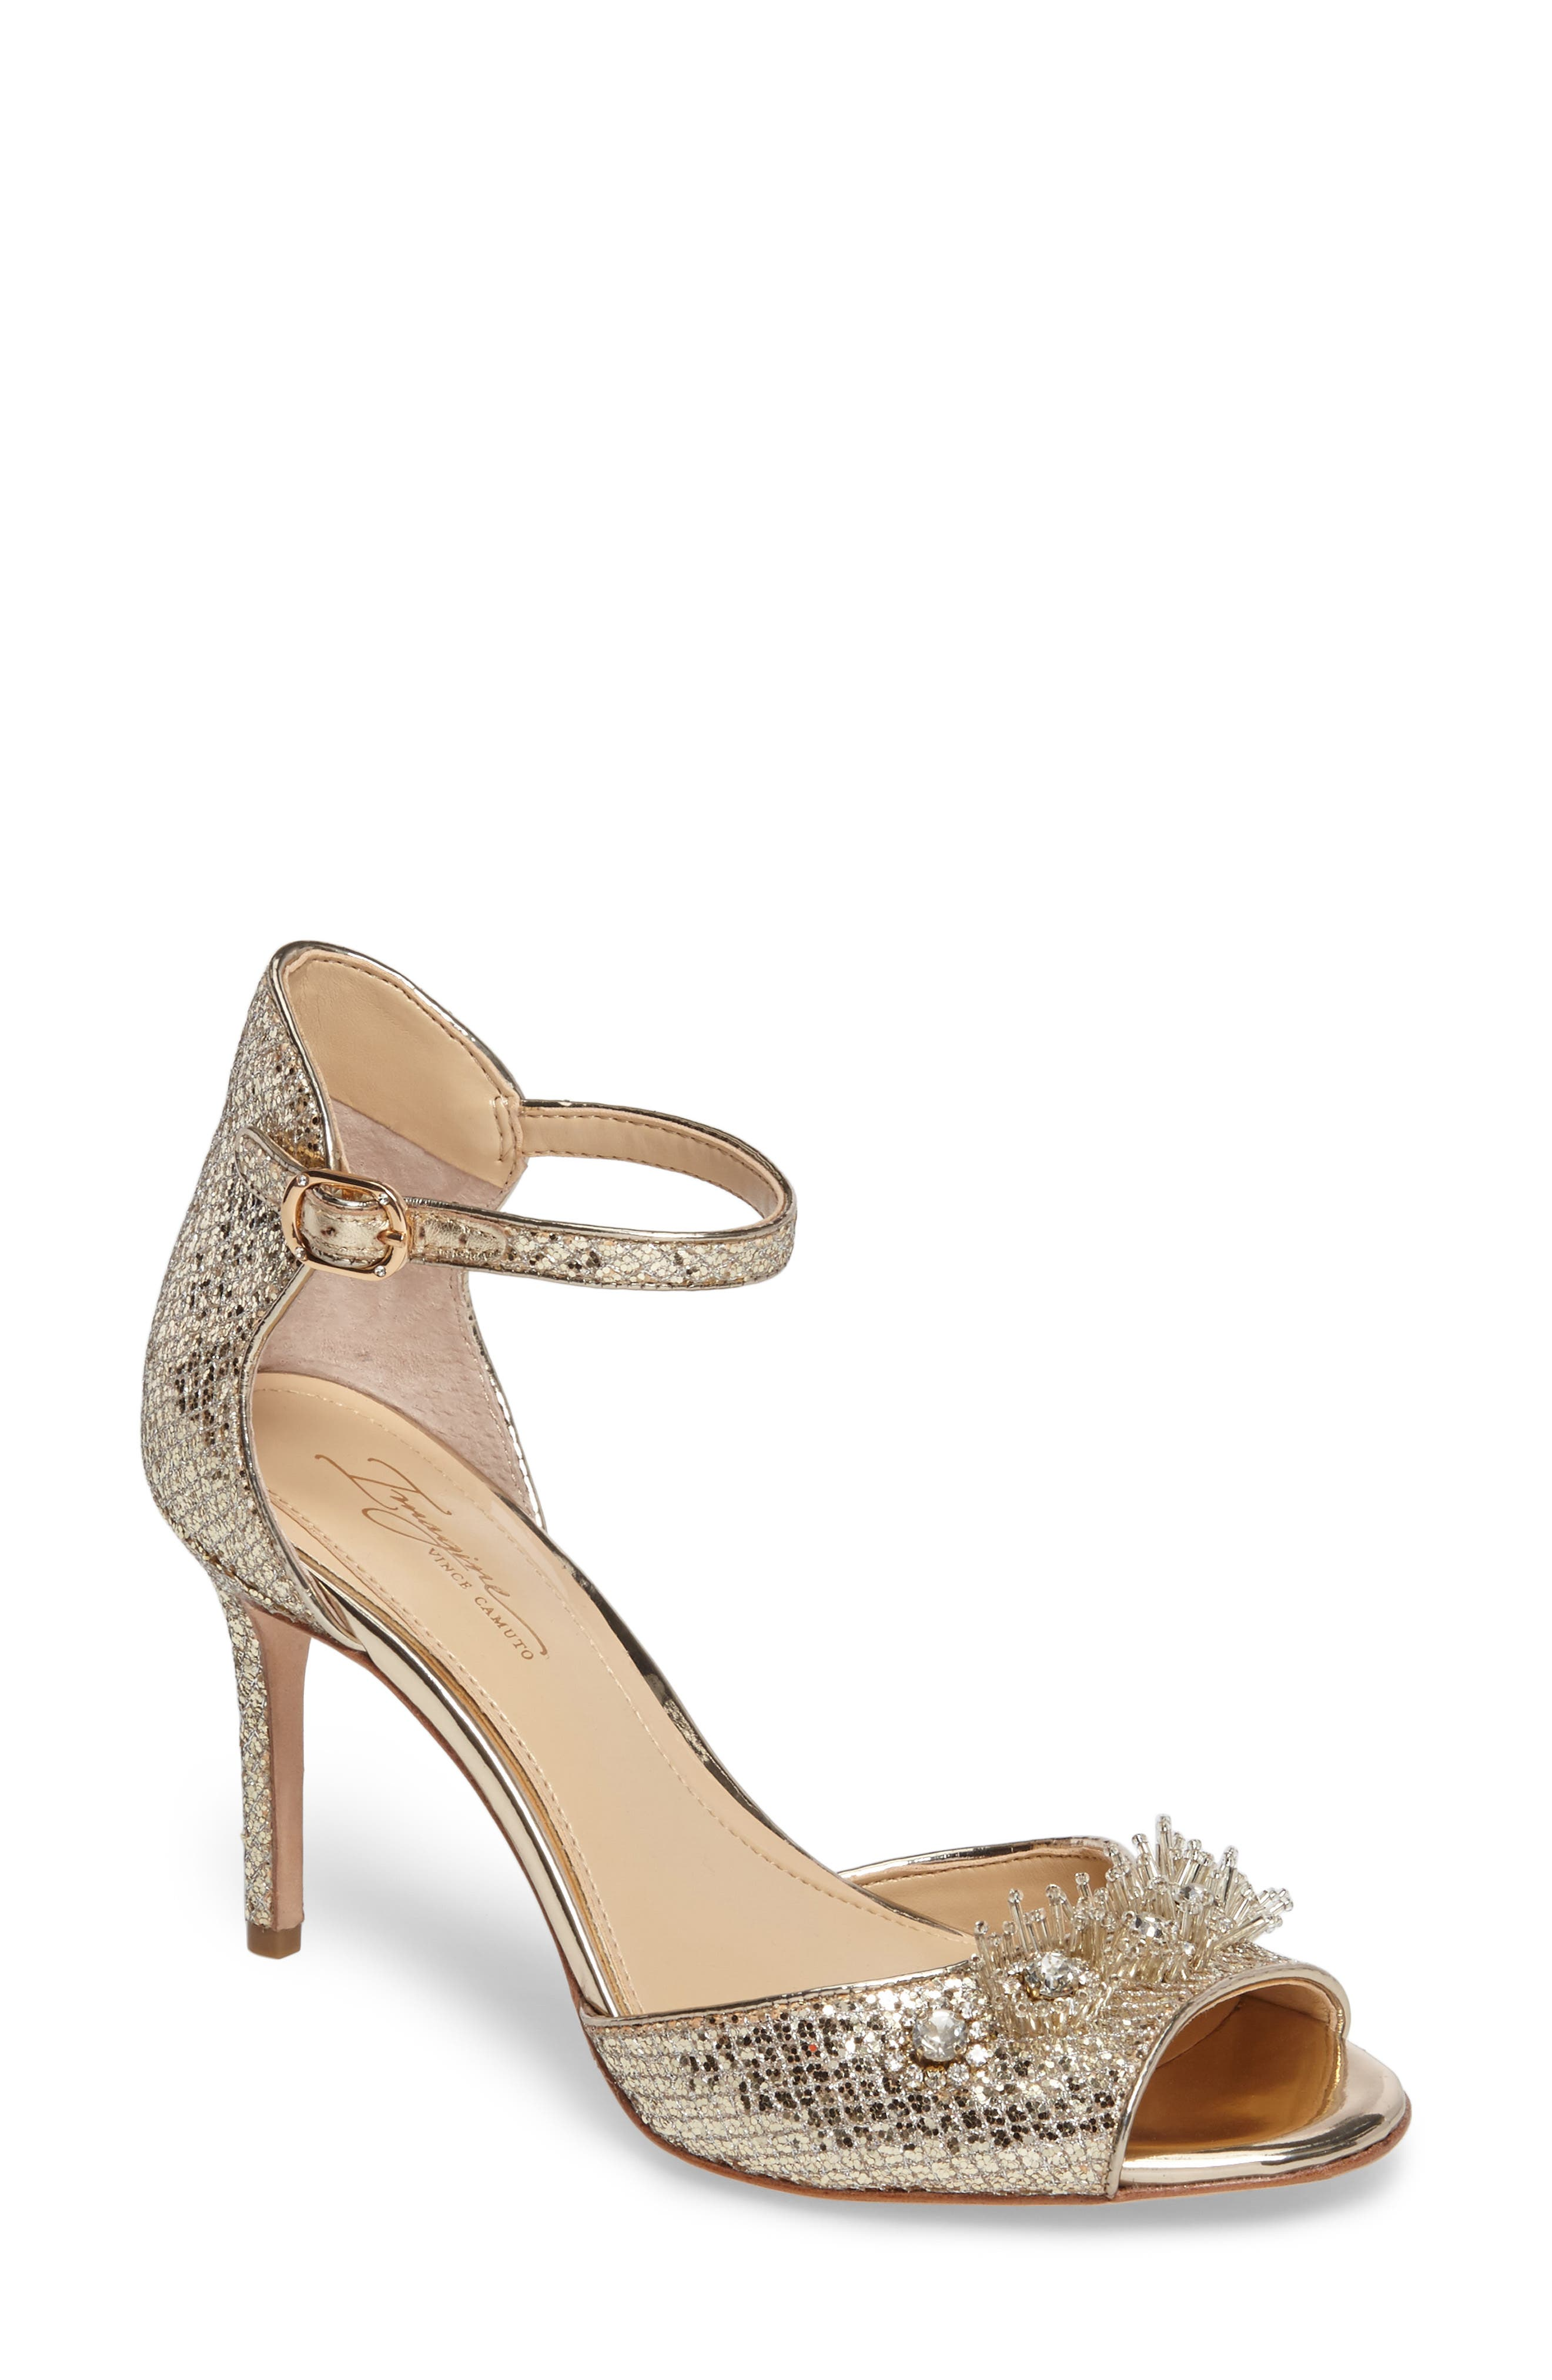 Imagine by Vince Camuto Prisca Embellished Sandal (Women)